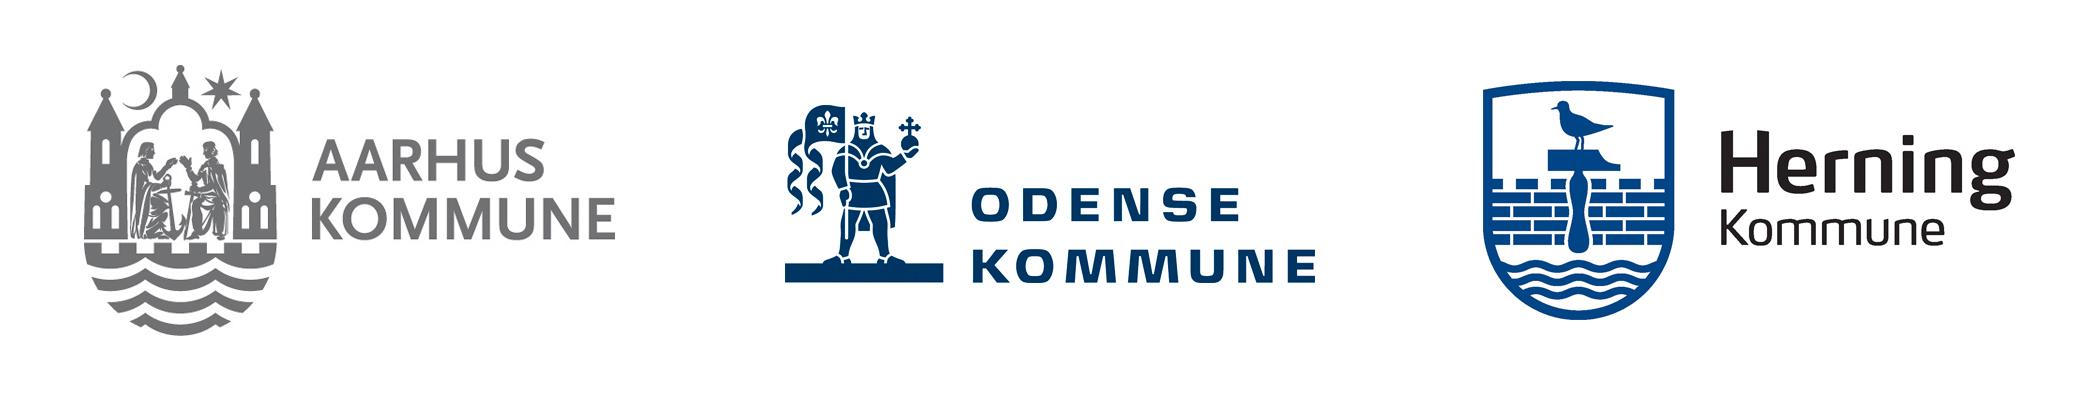 Aarhus-Odense-Herning_logos.jpg